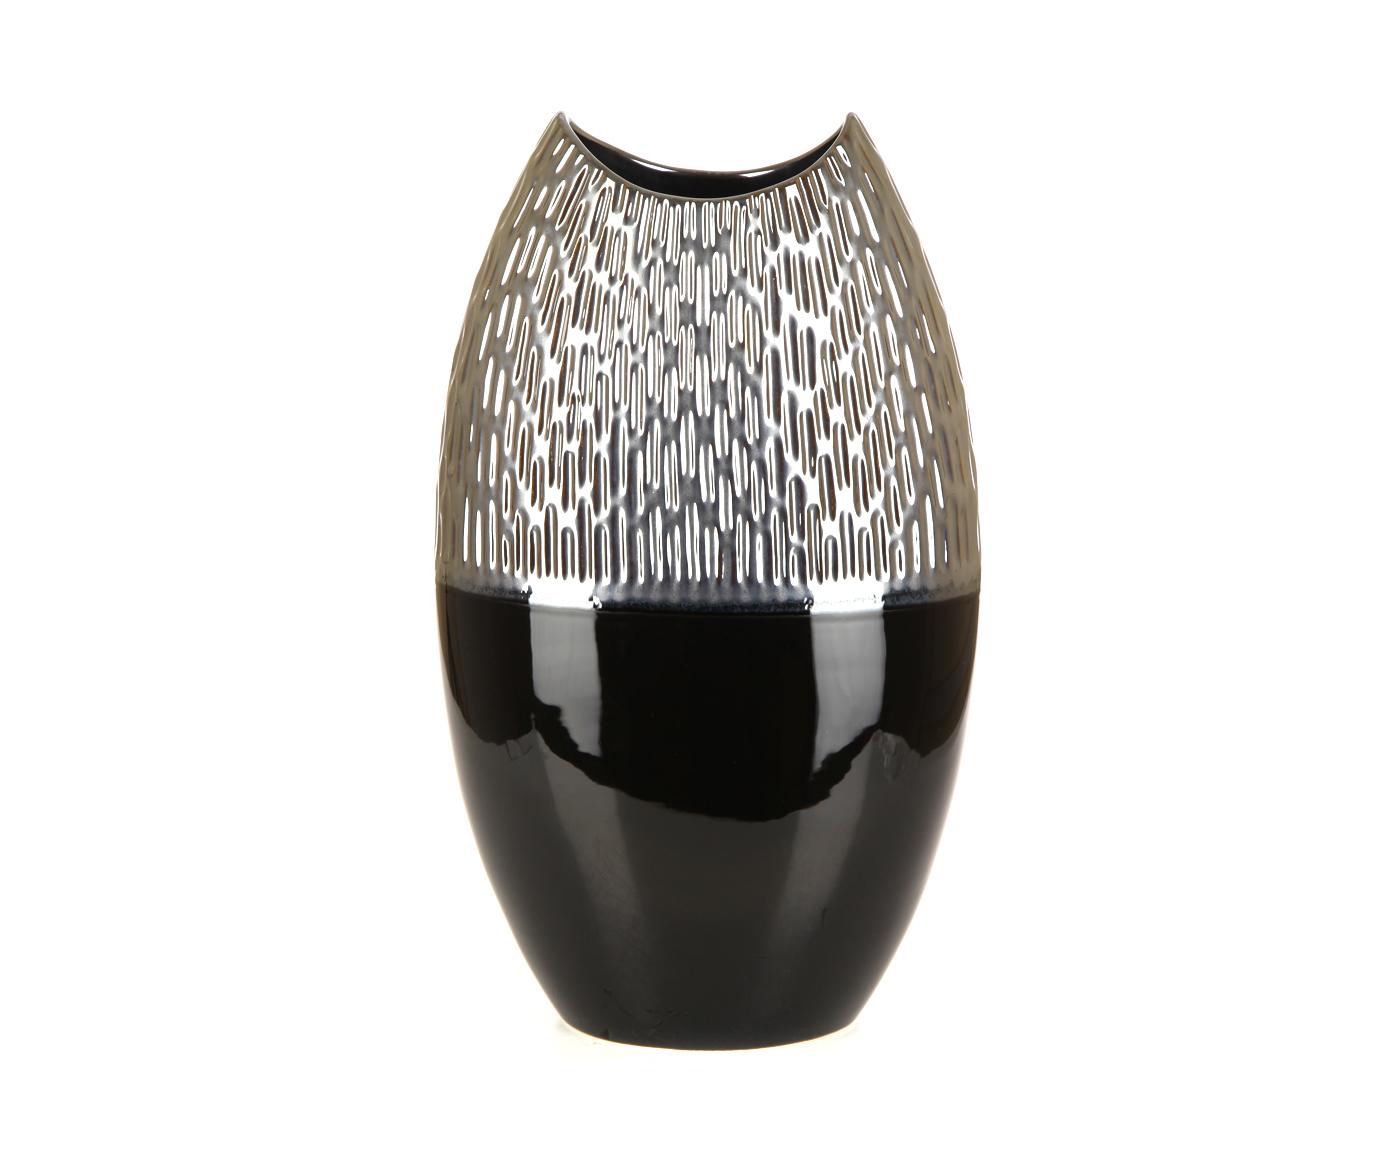 Вазы настольные Элитная ваза декоративная Лейрия высокая от Sporvil vaza-dekorativnaya-vysokaya-leyriya-serebro-s-chernym-ot-sporvil-portugaliya.jpg